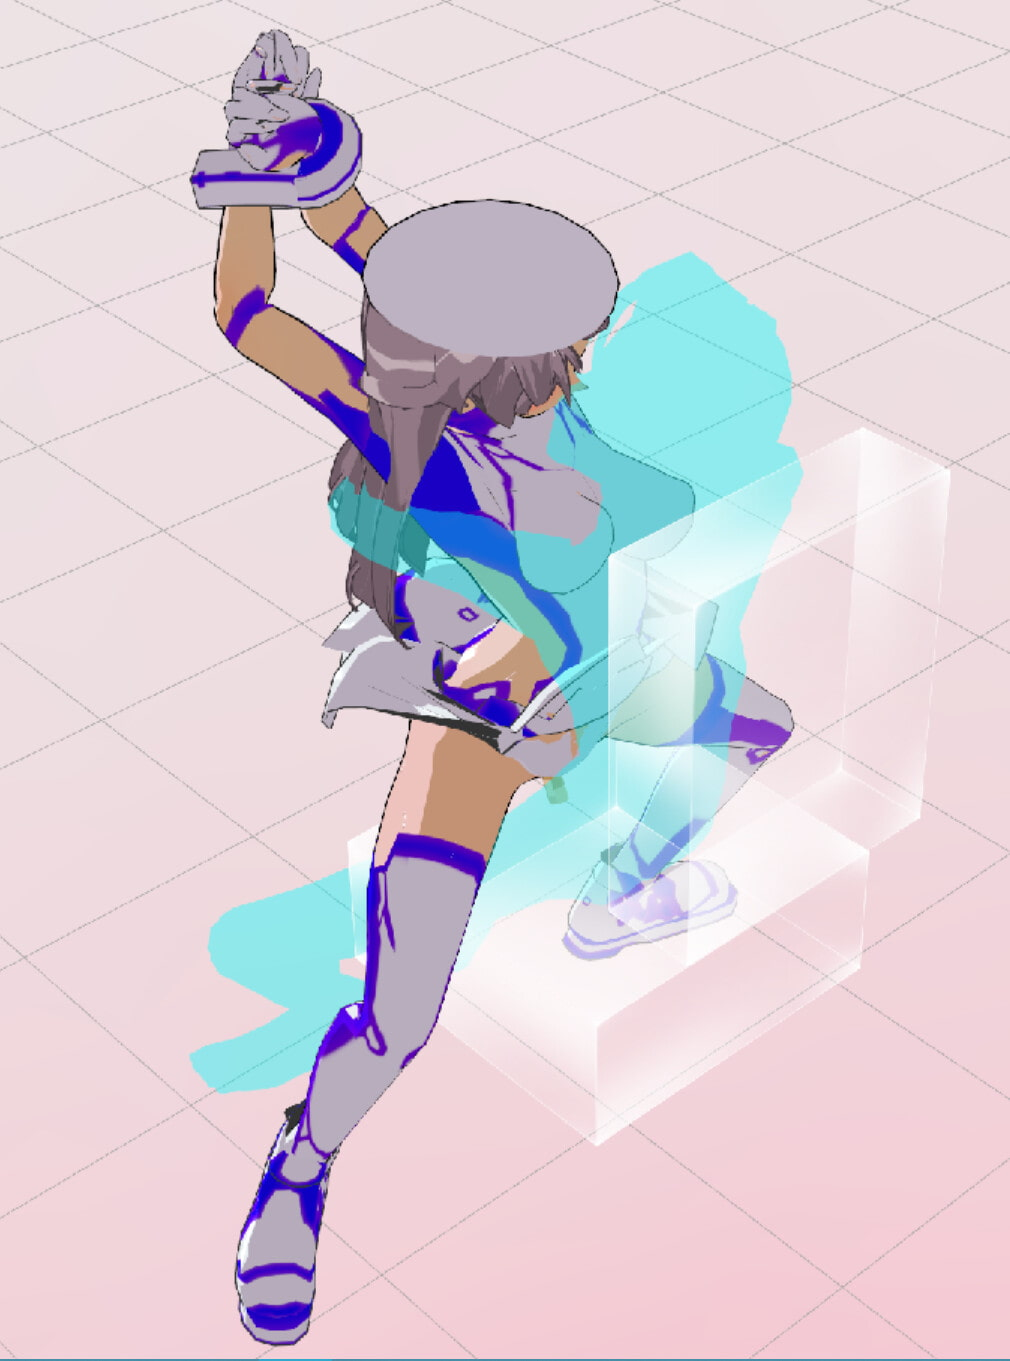 3Dカスタム少女追加モーション(座位モーション)SmallPack2